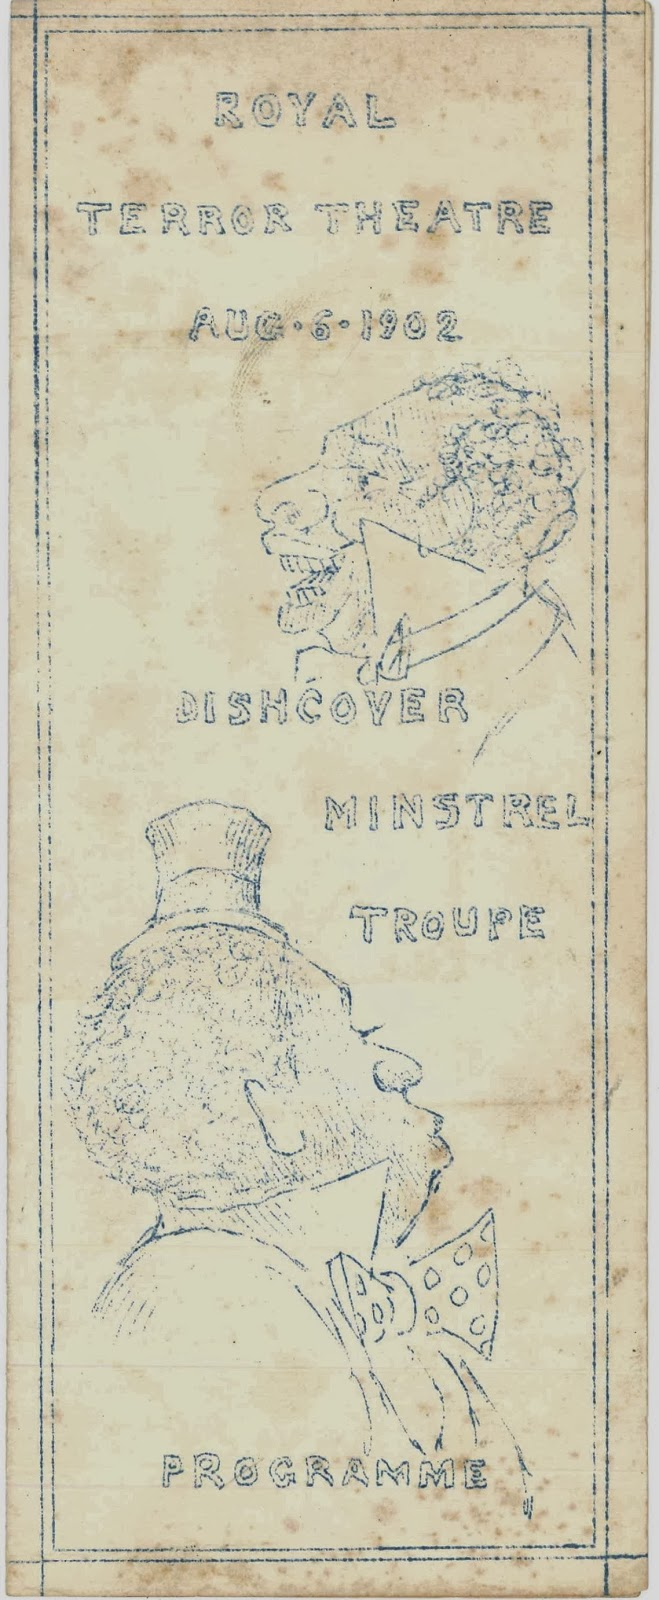 A program for a 1902 minstrel performance.